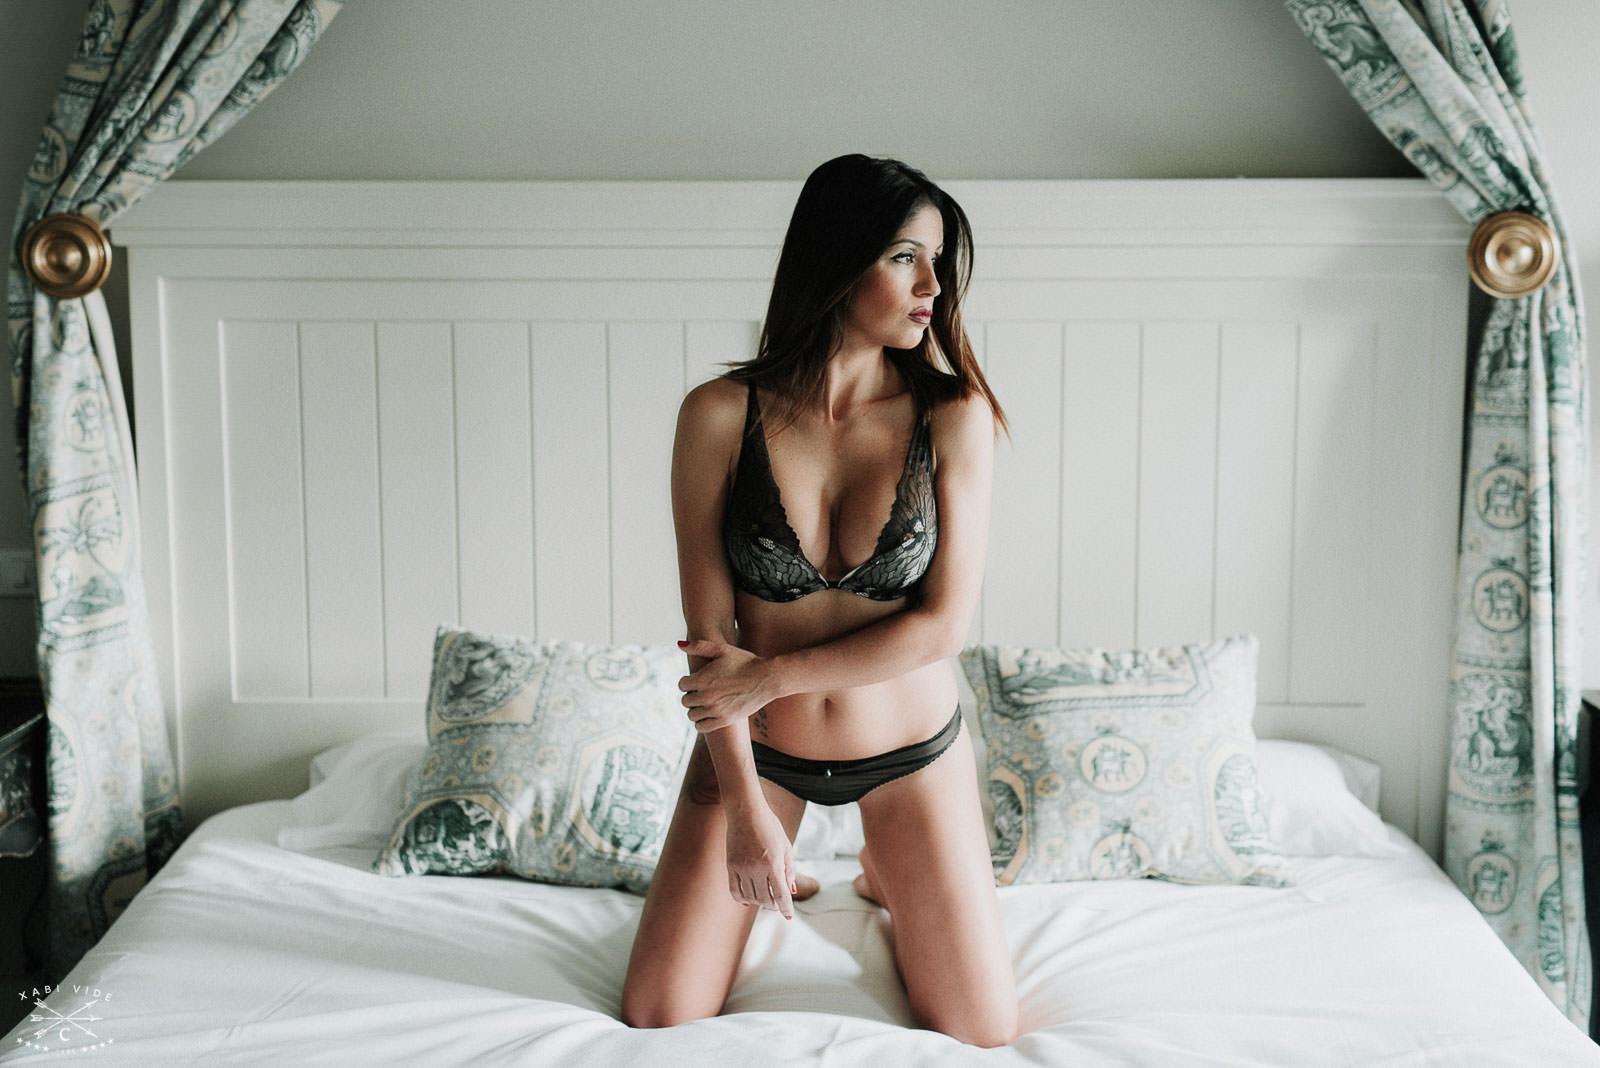 fotografía boudoir-12